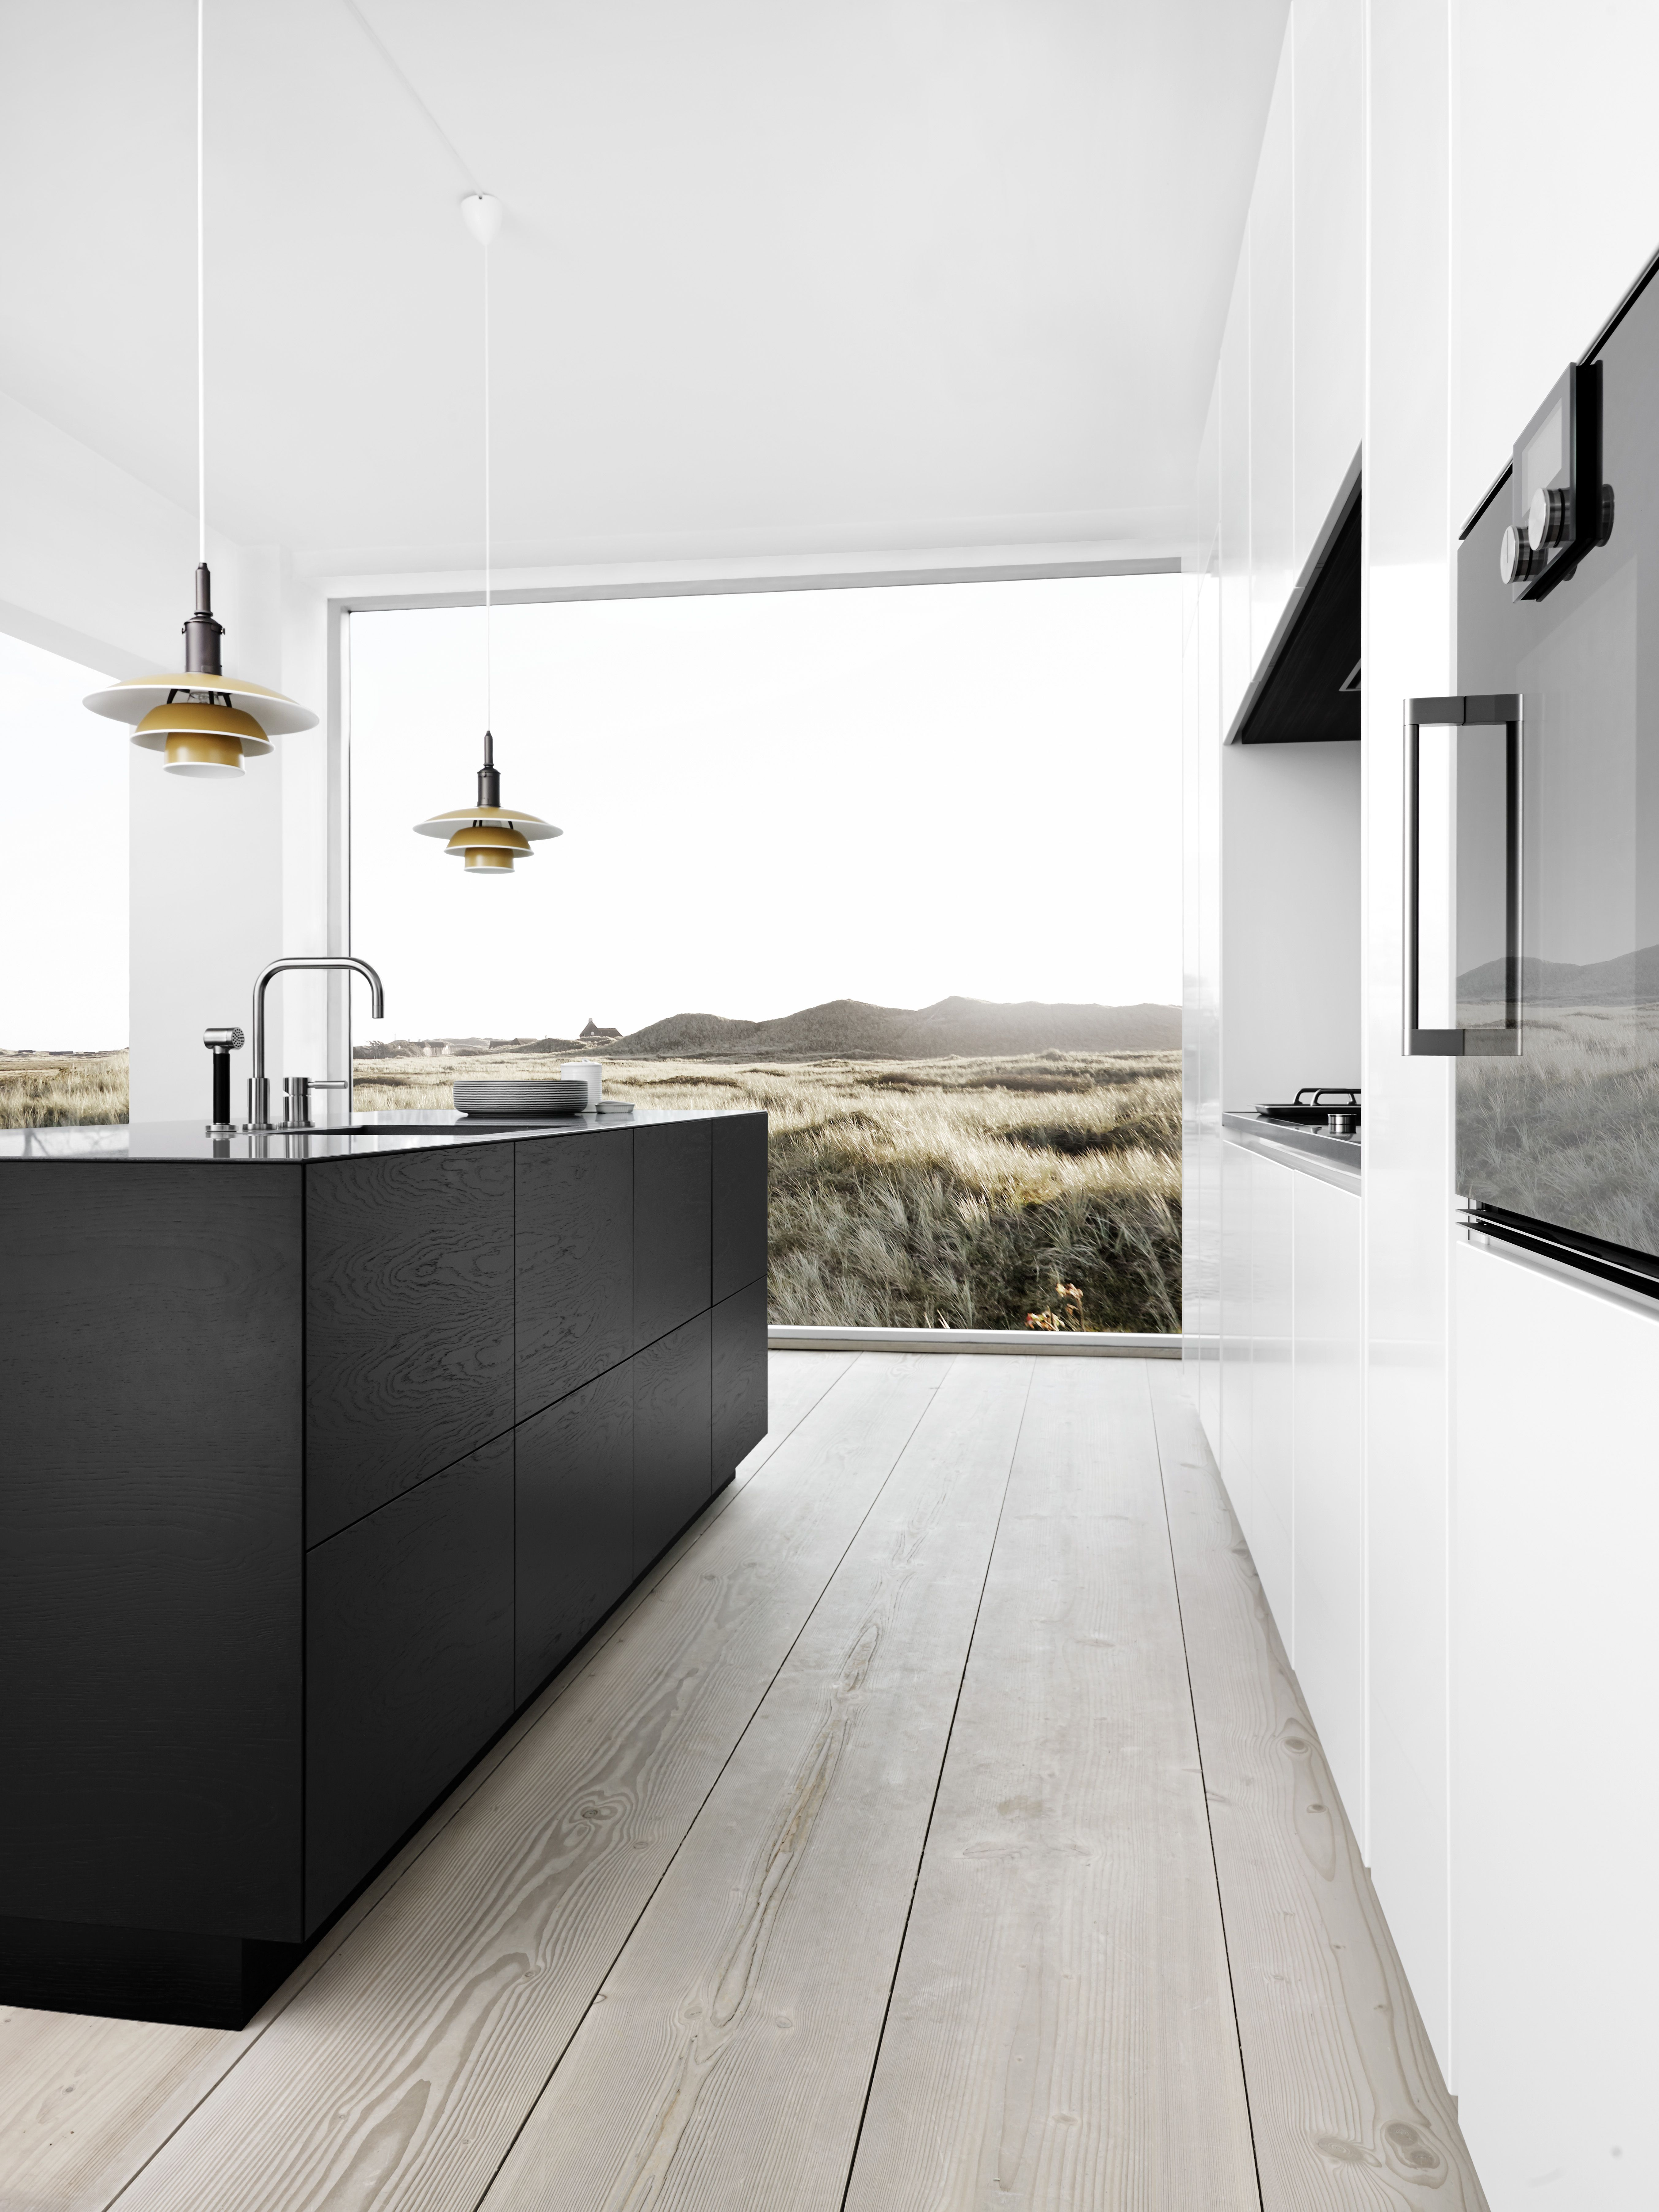 Form 45 // Black oak + Form 6 // White kitchen by